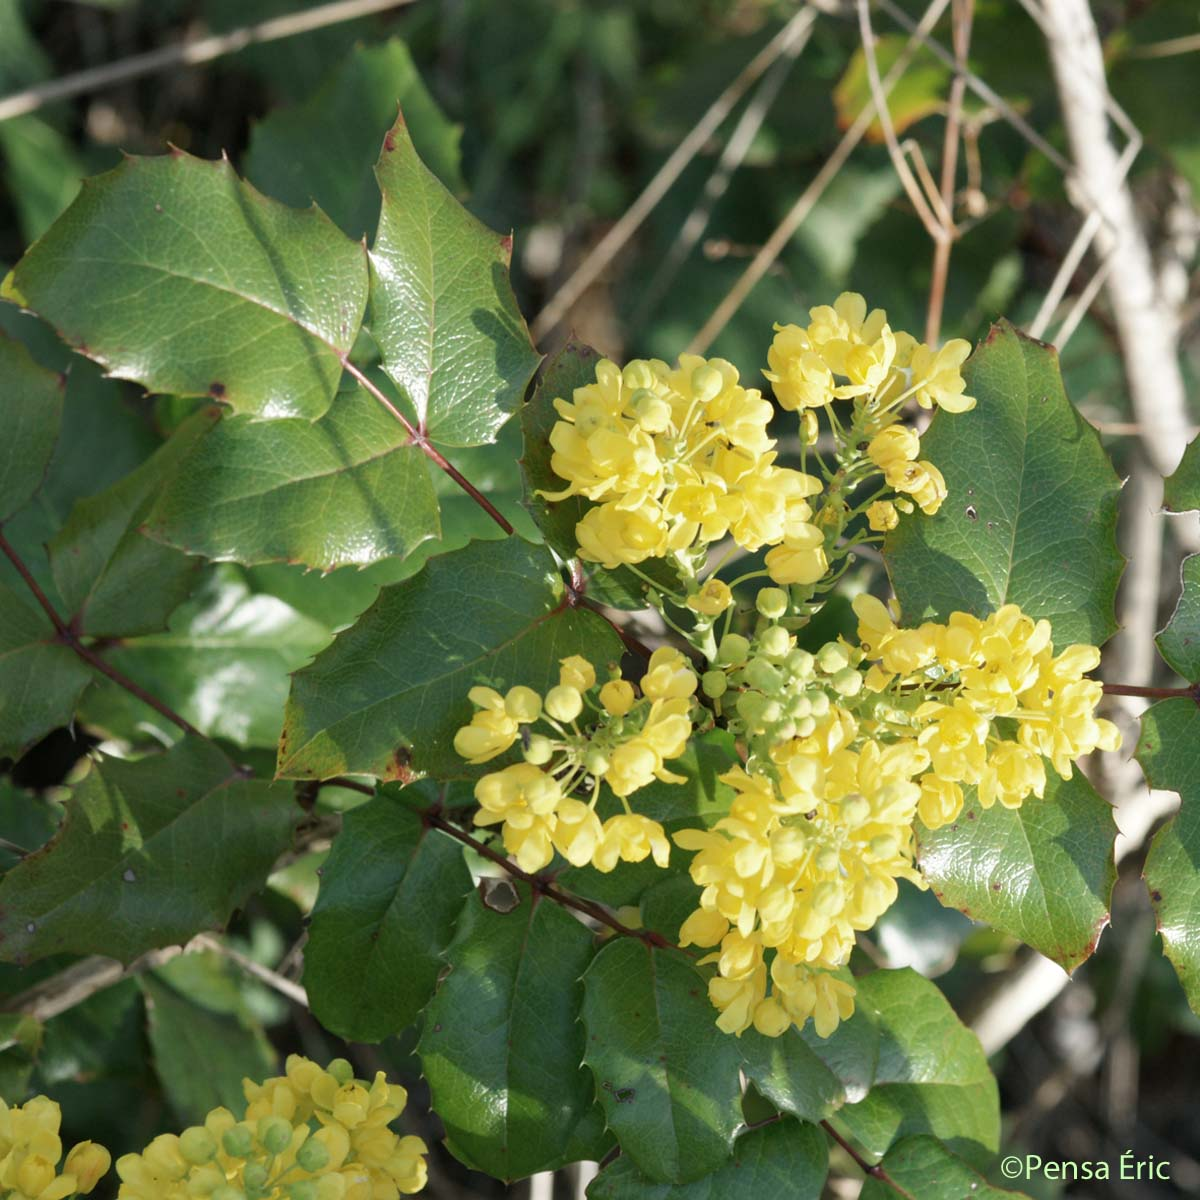 mahonia feuilles de houx berberis aquifolium quelle est cette. Black Bedroom Furniture Sets. Home Design Ideas